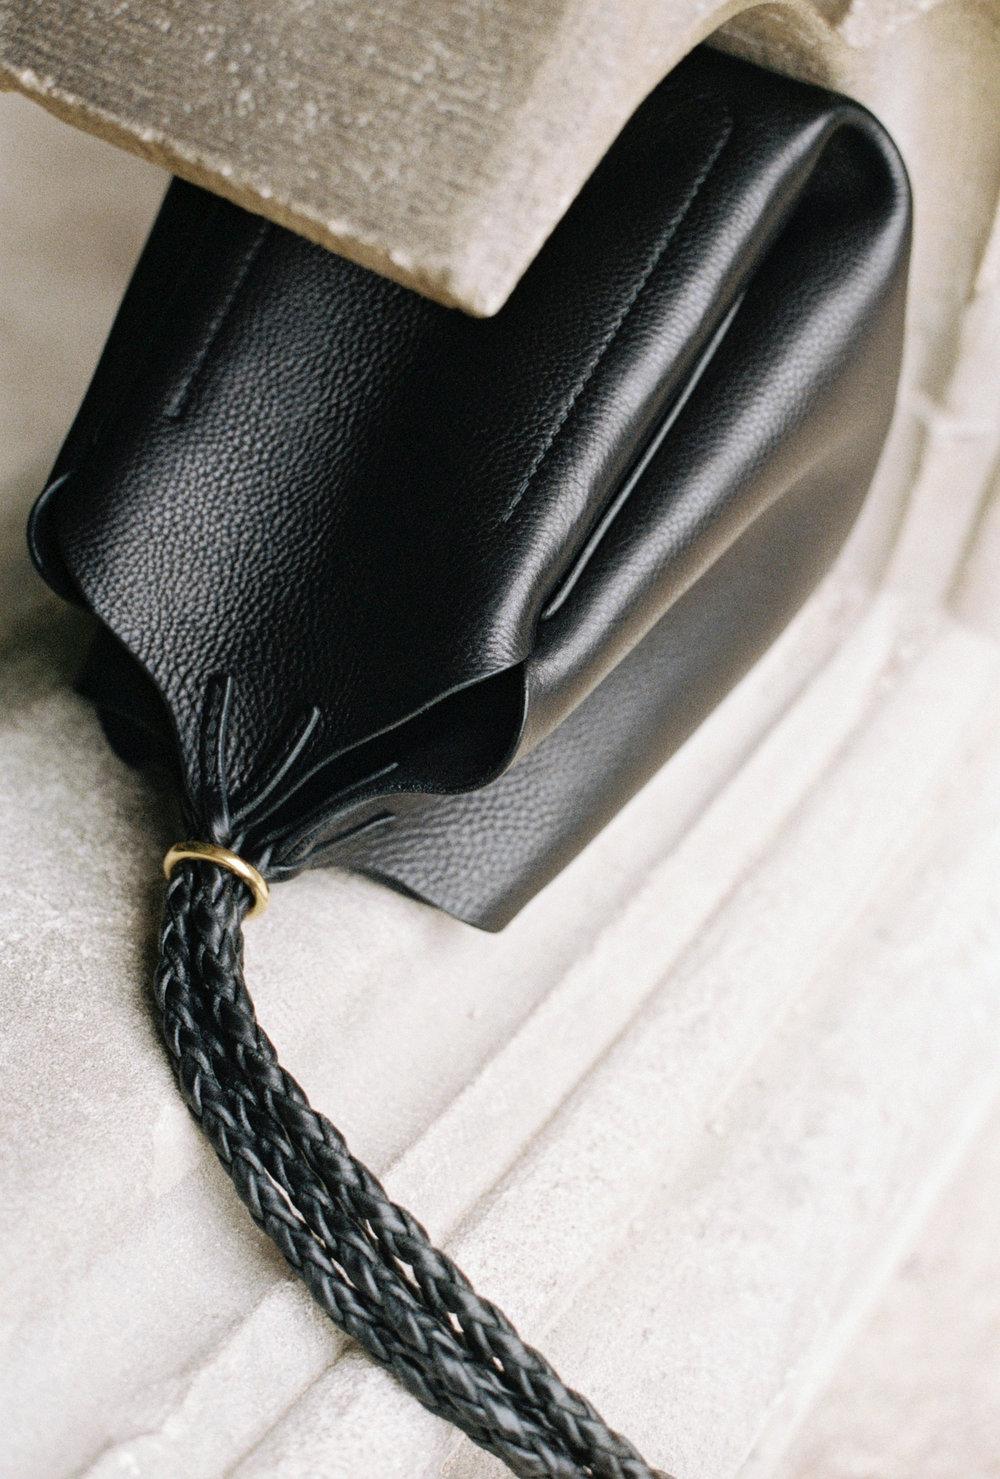 Mark Tallowin Handbag